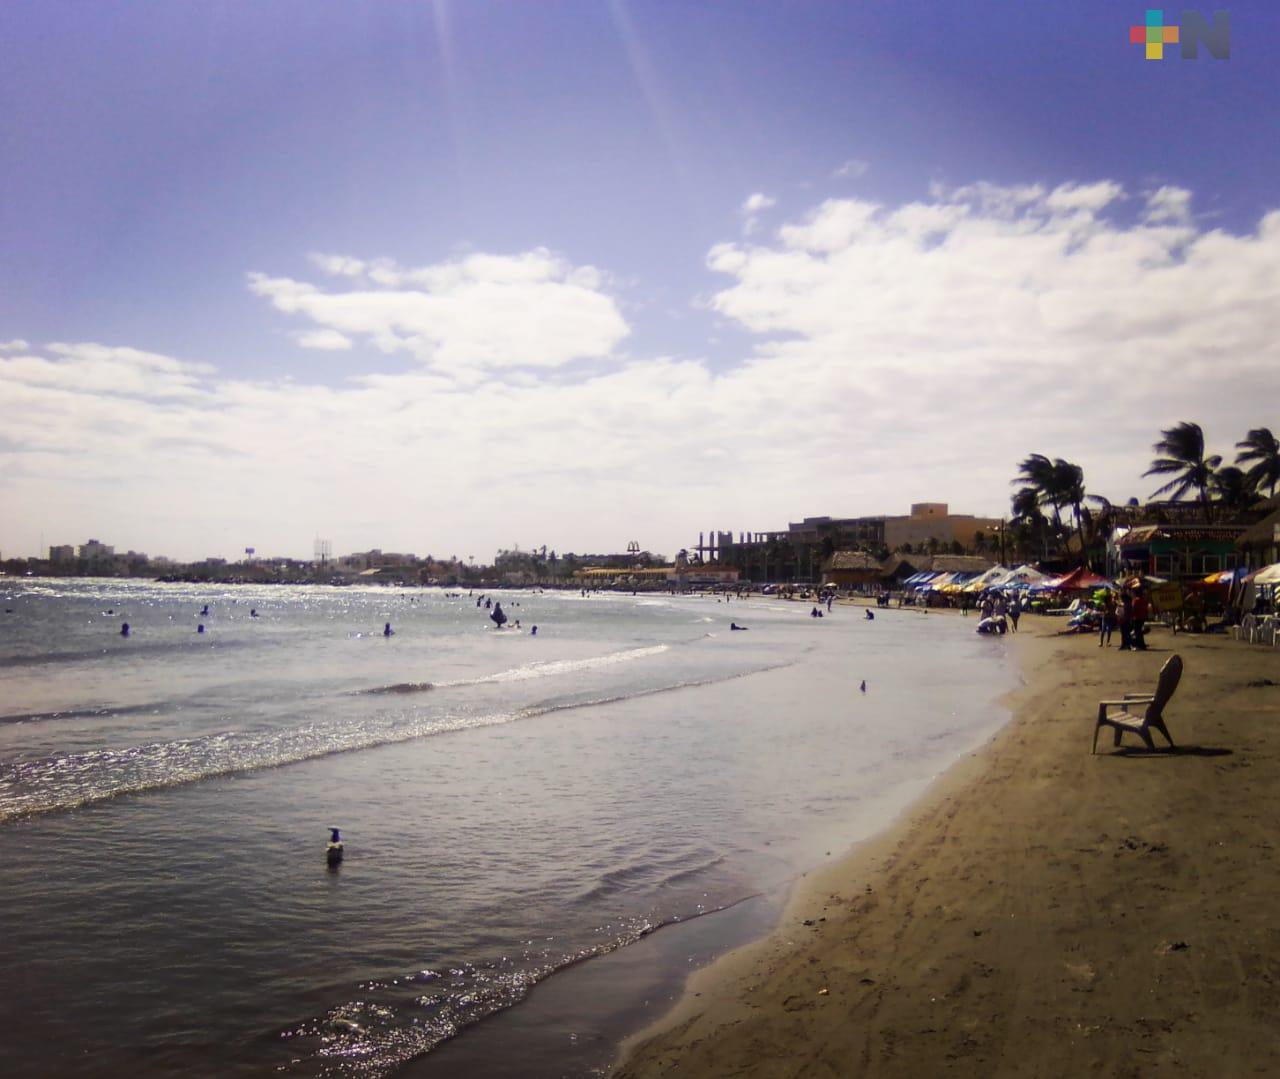 Playas de municipio de Veracruz permanecerán con libre acceso: Alfonso García